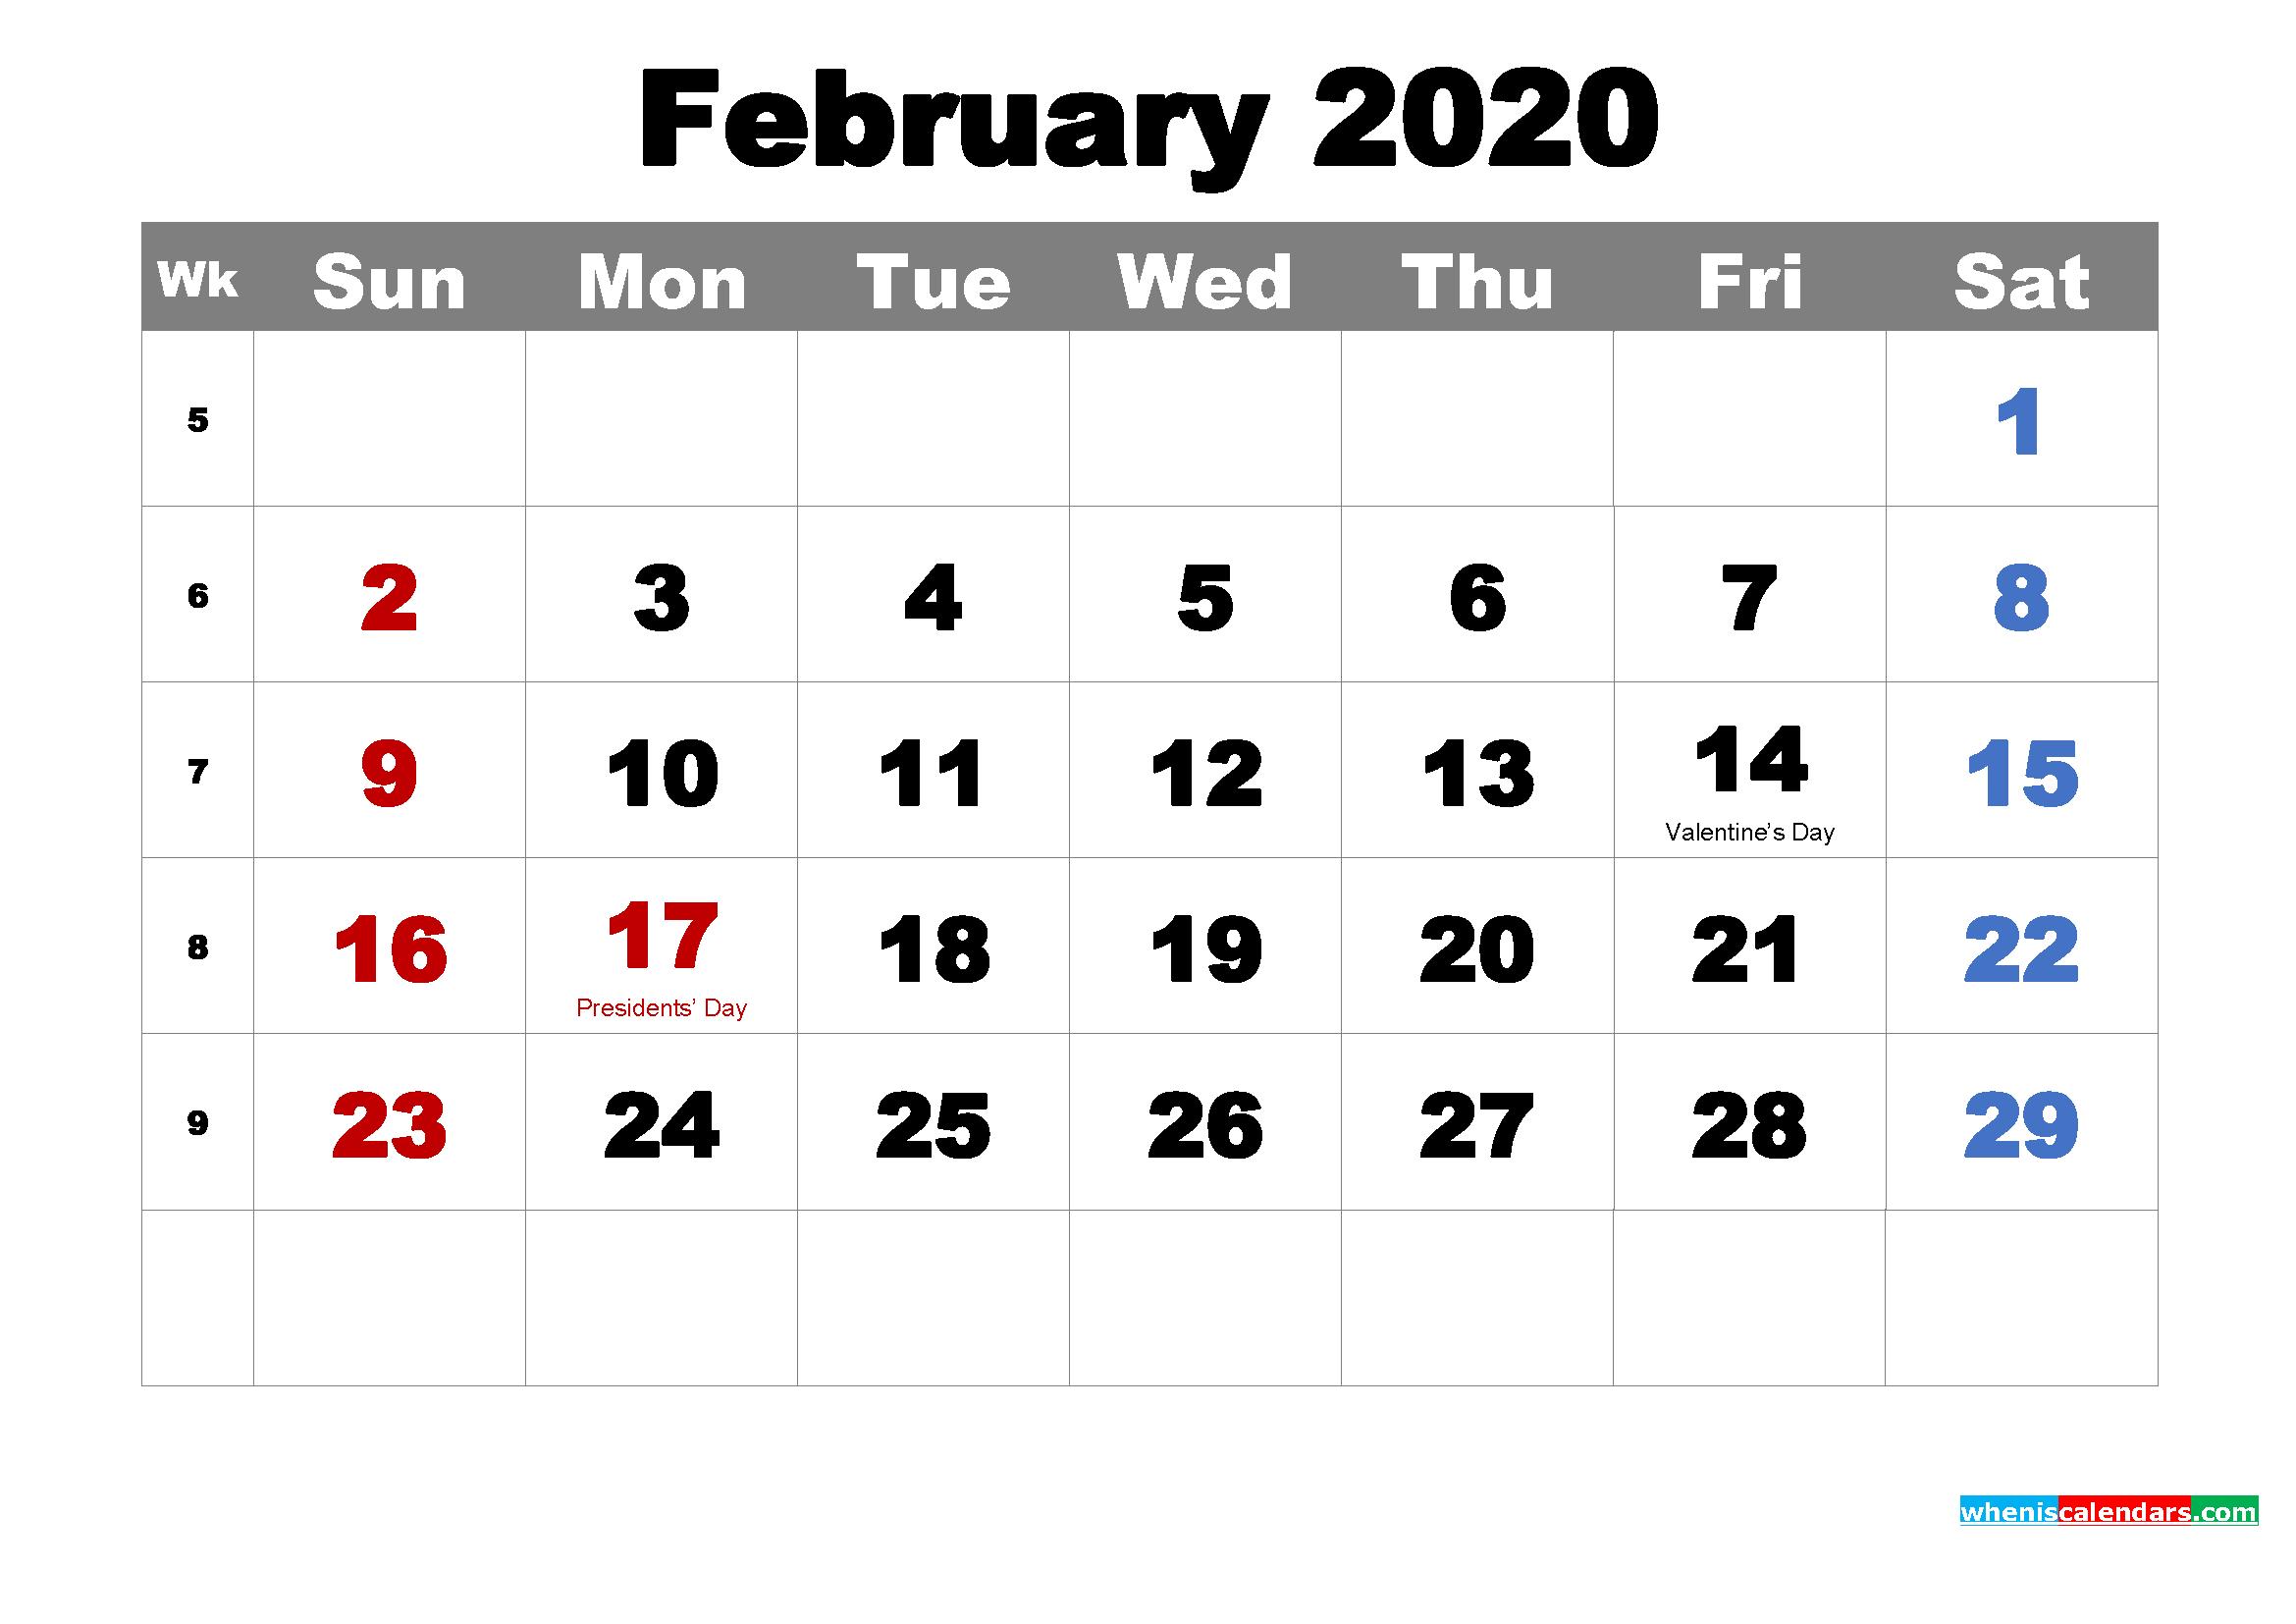 Printable Calendar February 2020 with Holidays as Word, PDF